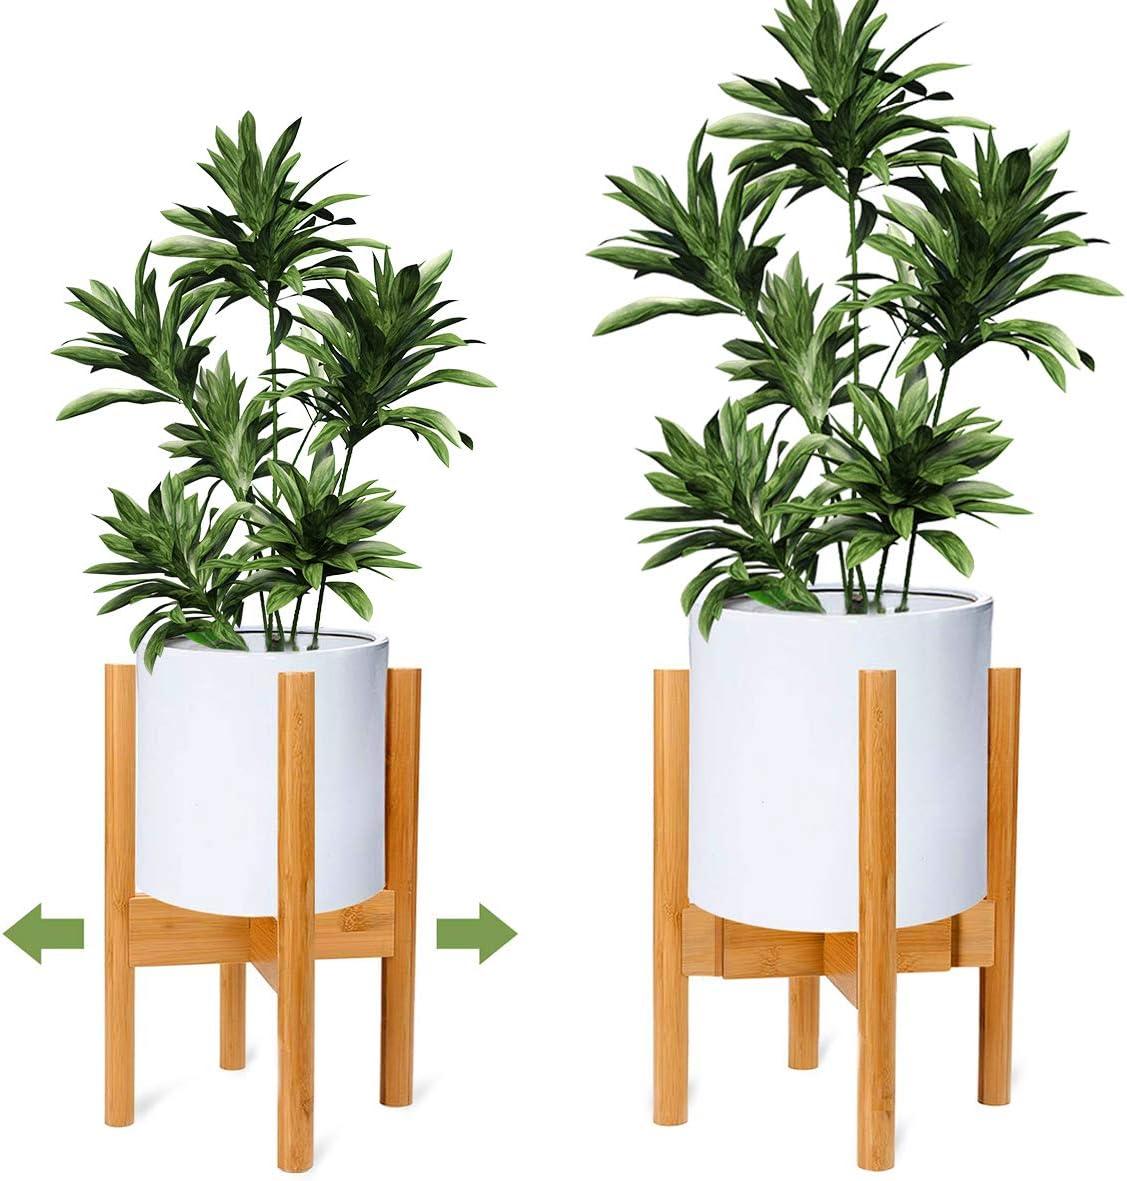 Modern Planter Mid Century Modern Plant Stand Potted Plant Stand Pot and Plant Not Included Planter Stand Mid Century Plant Stand